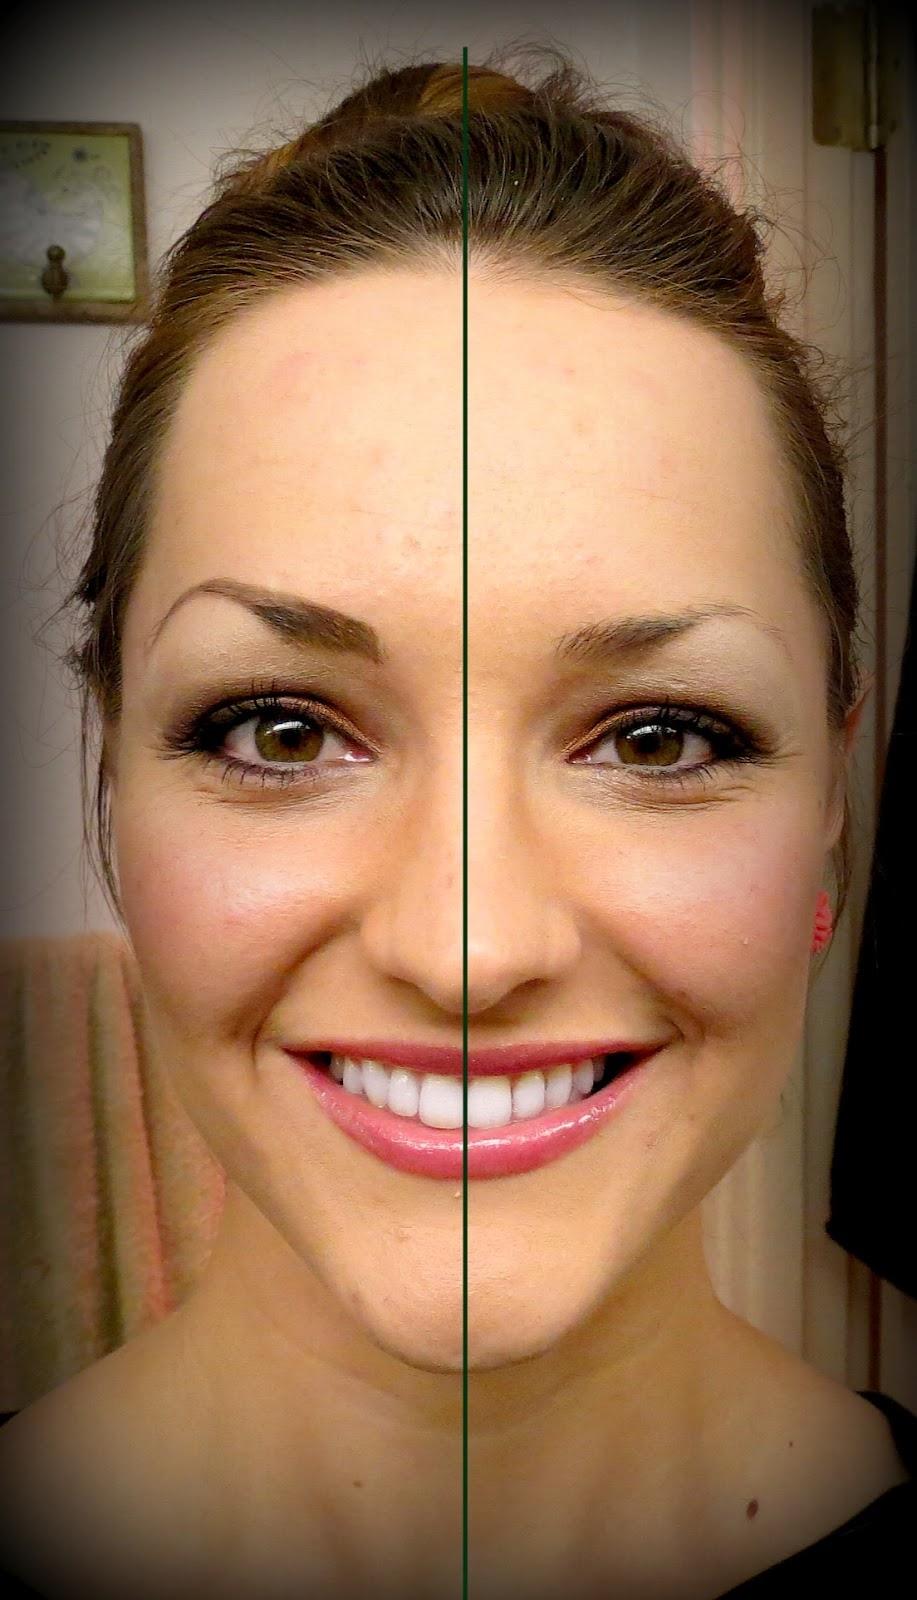 How To Fix Your Eyebrows | Trusper